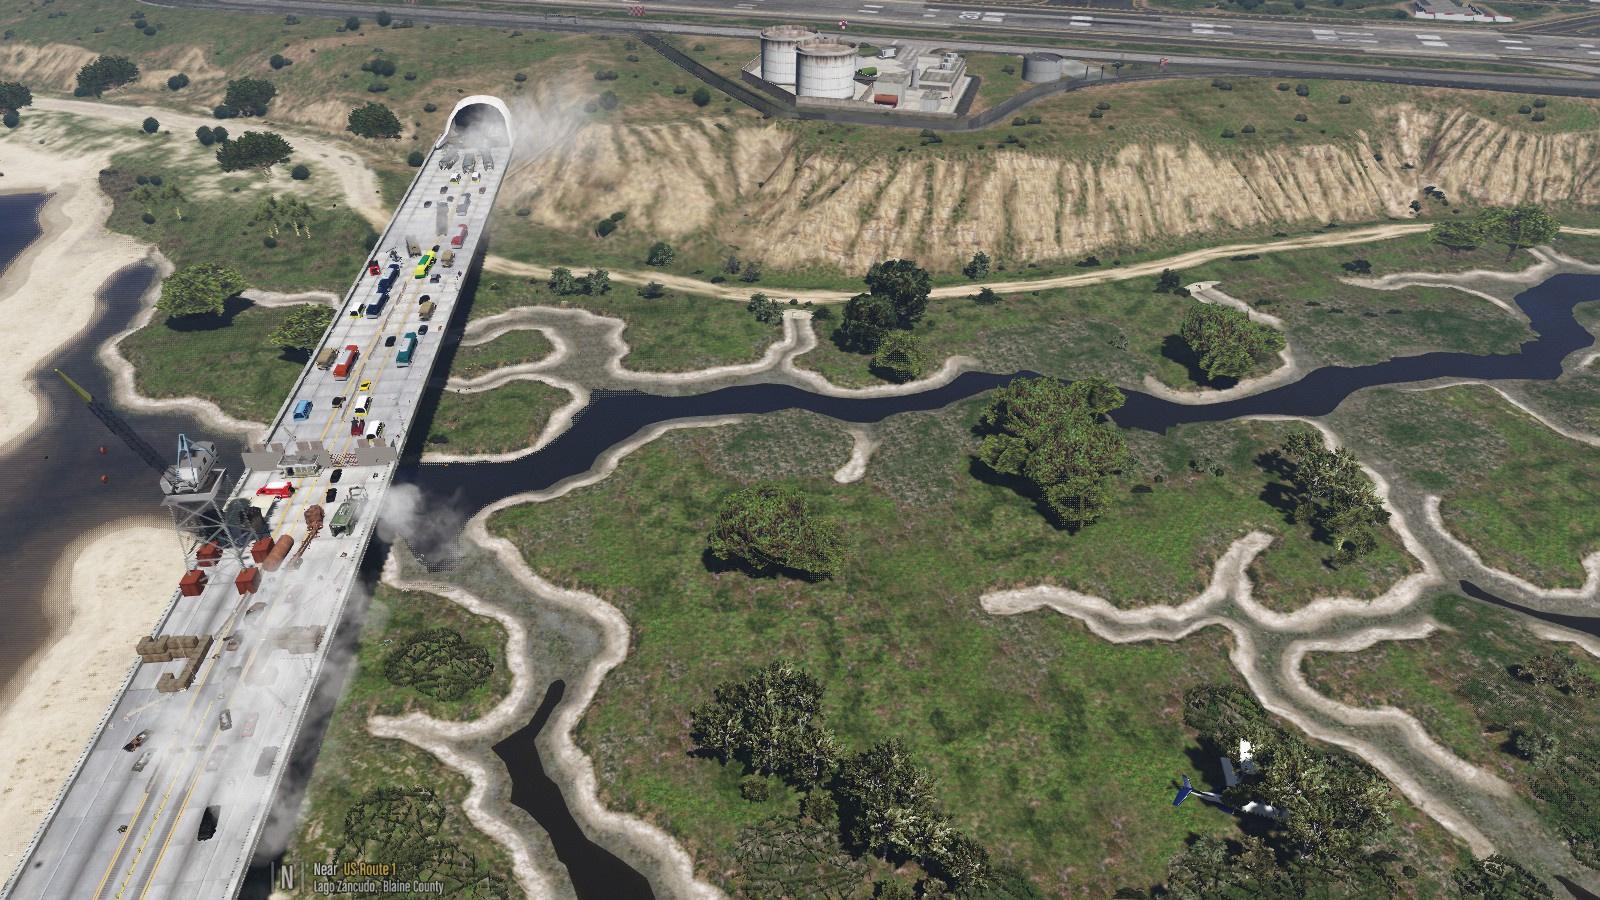 Fort Zancudo Bridge Zombies [Menyoo] [LITE included] - GTA5-Mods com